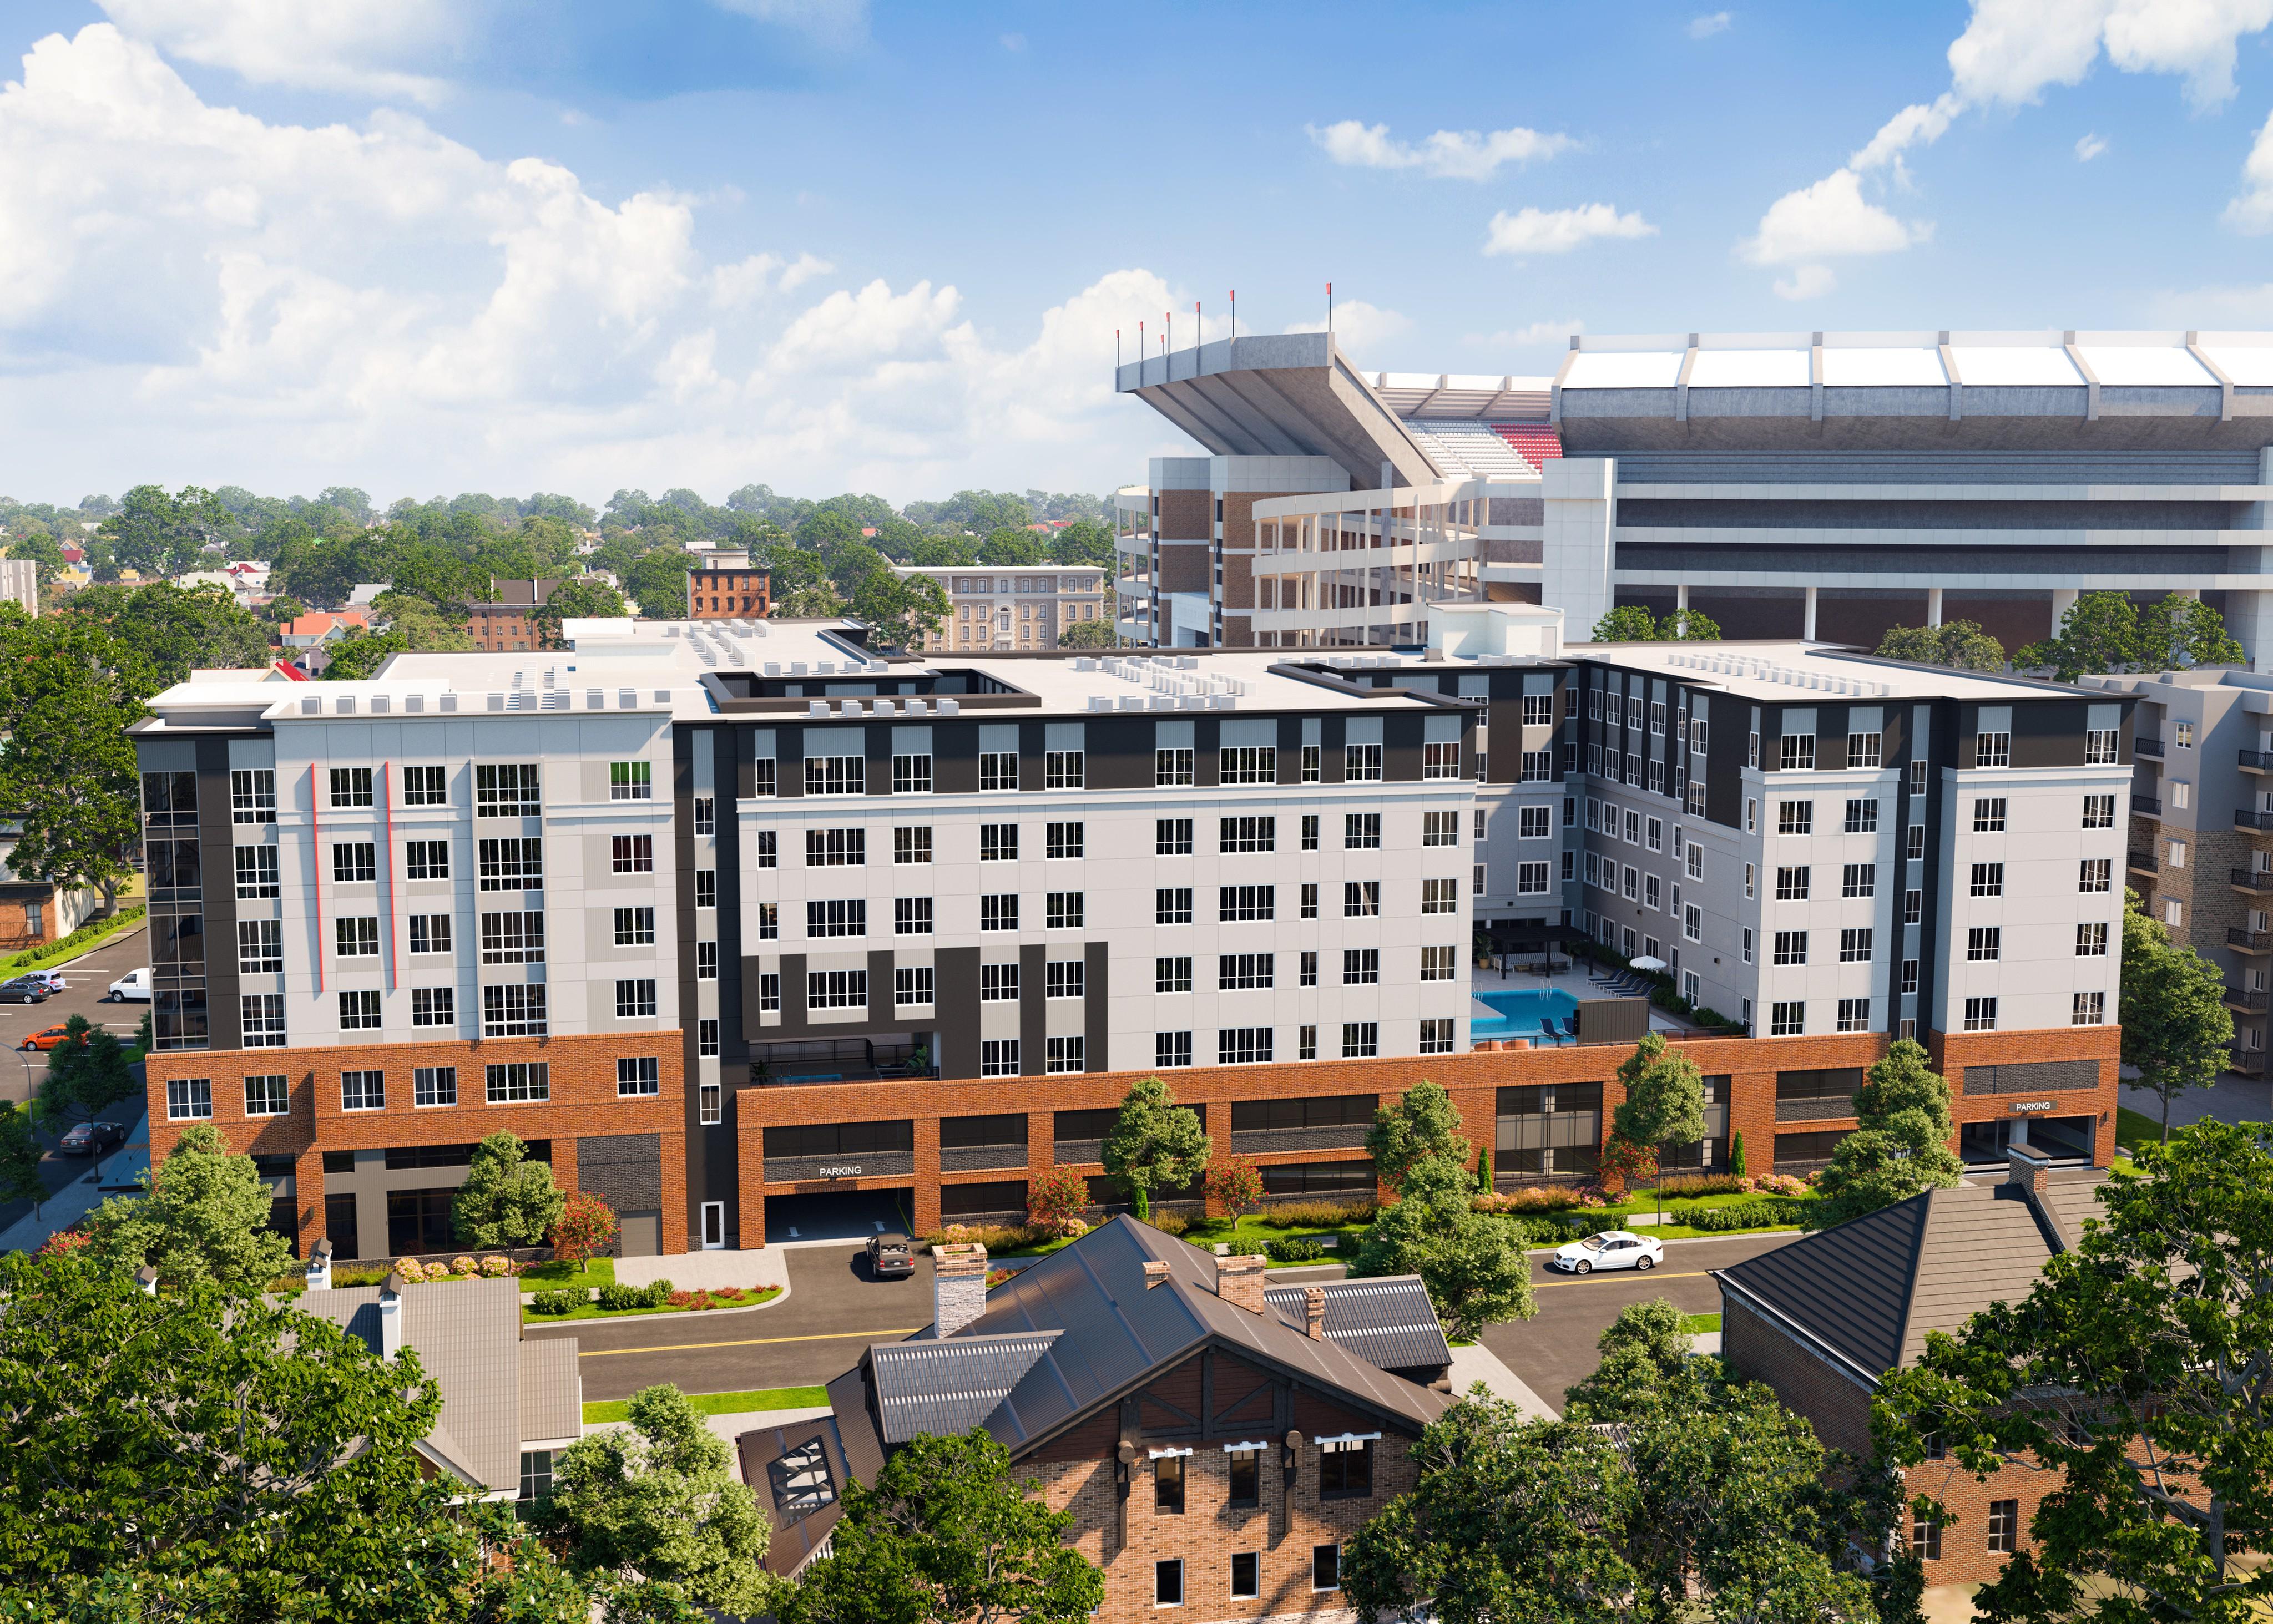 Apartments Near Tuscaloosa Student Housing Coming 2021 - HERE Tuscaloosa for Tuscaloosa Students in Tuscaloosa, AL